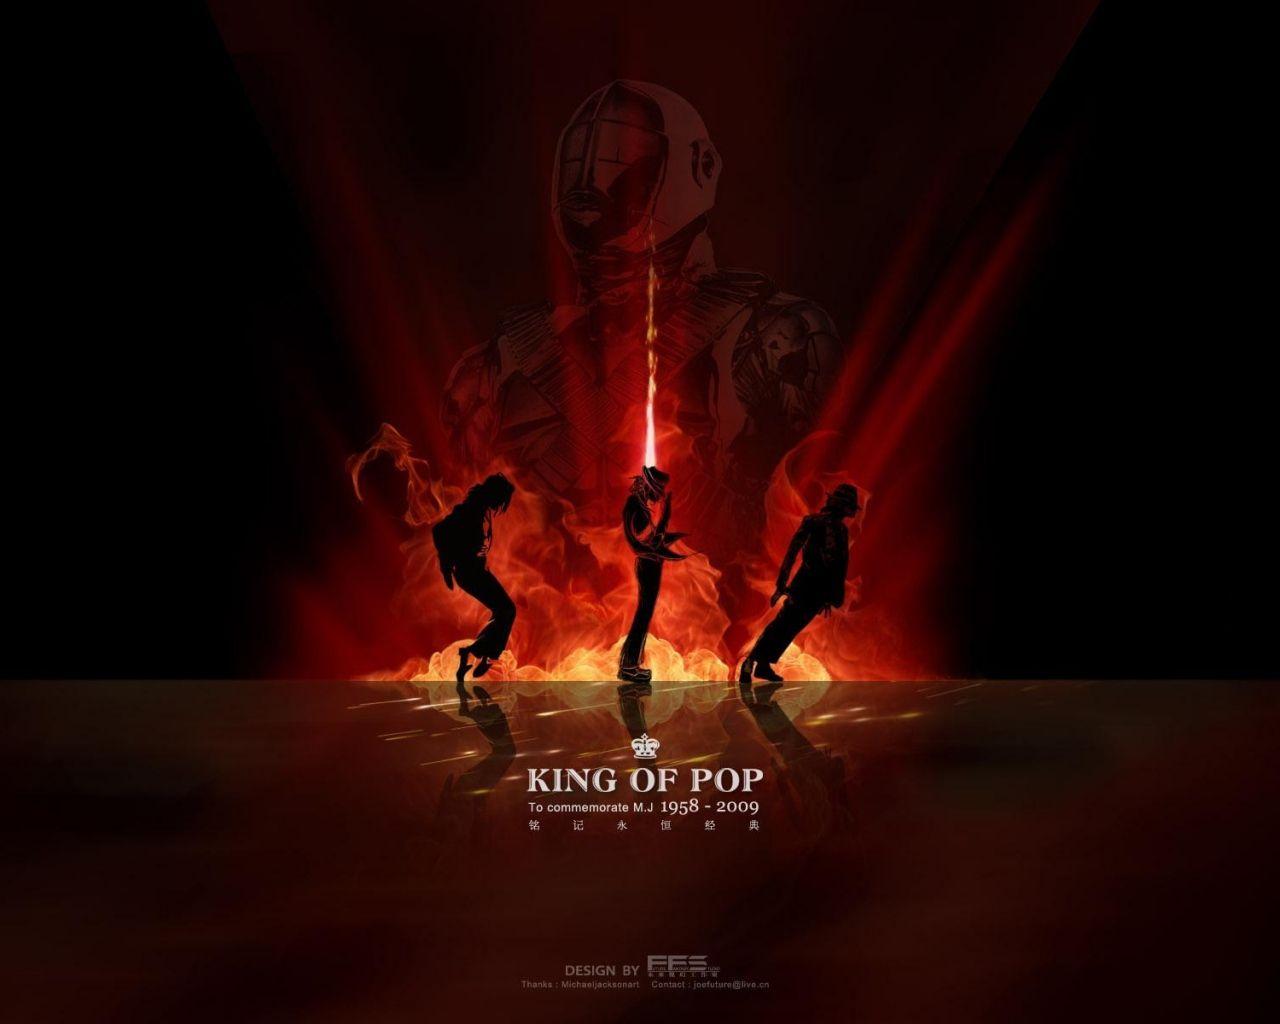 Download Wallpaper 1280x1024 michael jackson, king, dance, silhouette, fire 1280x1024 HD Background